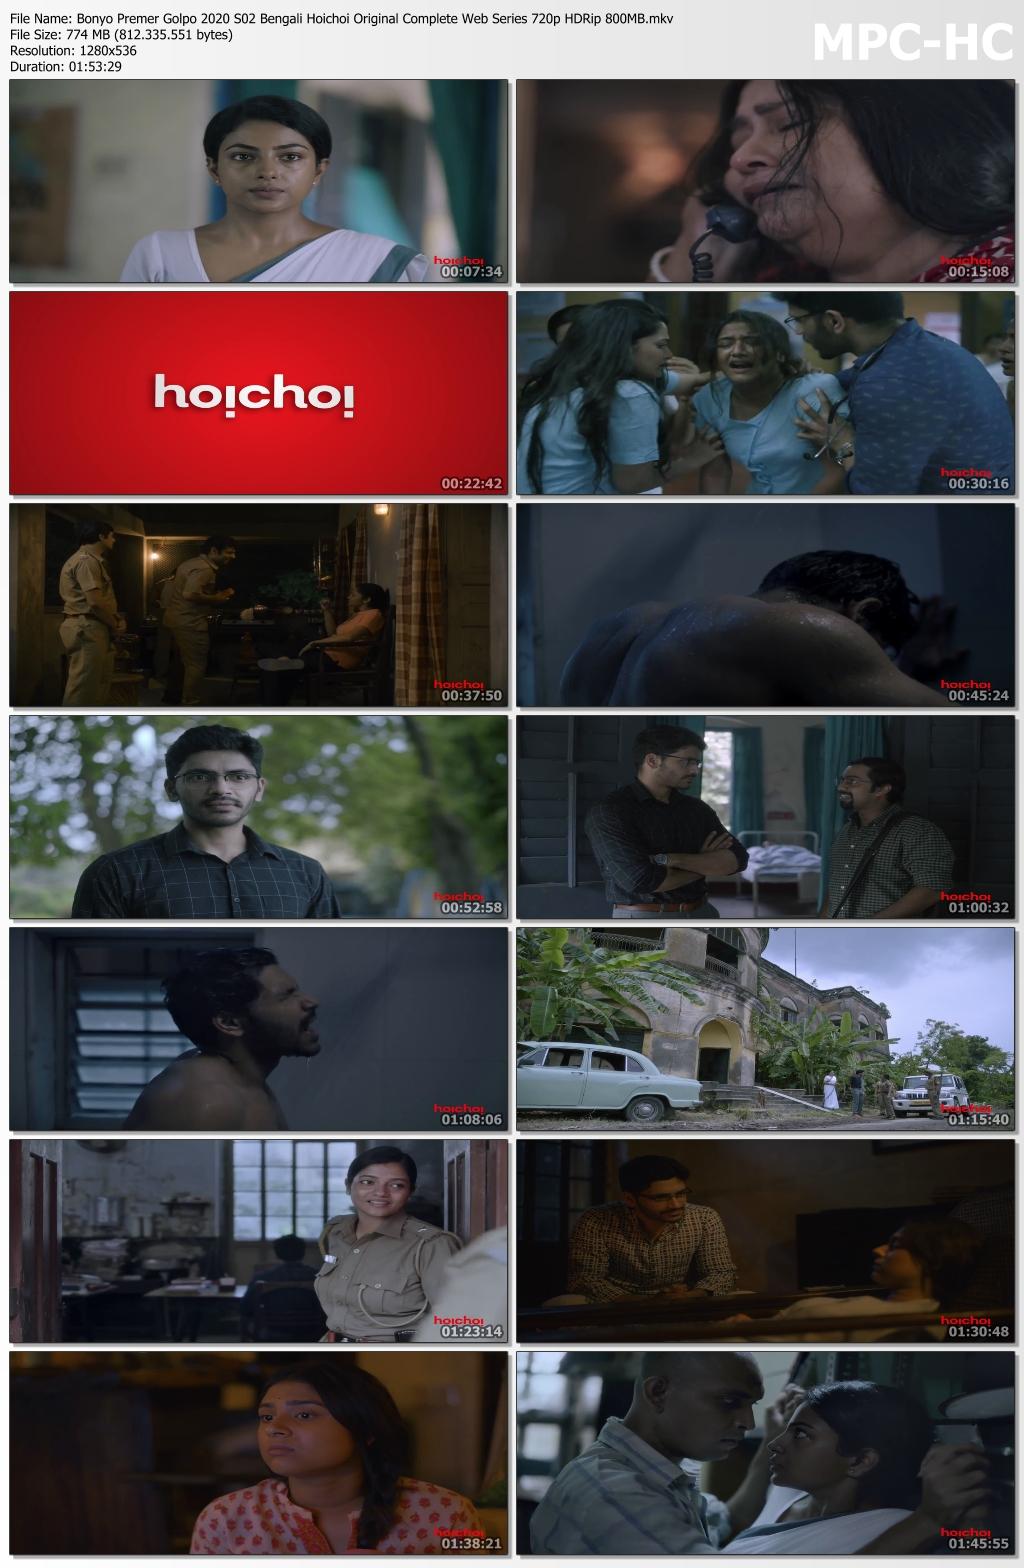 Bonyo-Premer-Golpo-2020-S02-Bengali-Hoichoi-Original-Complete-Web-Series-720p-HDRip-800-MB-mkv-thumb